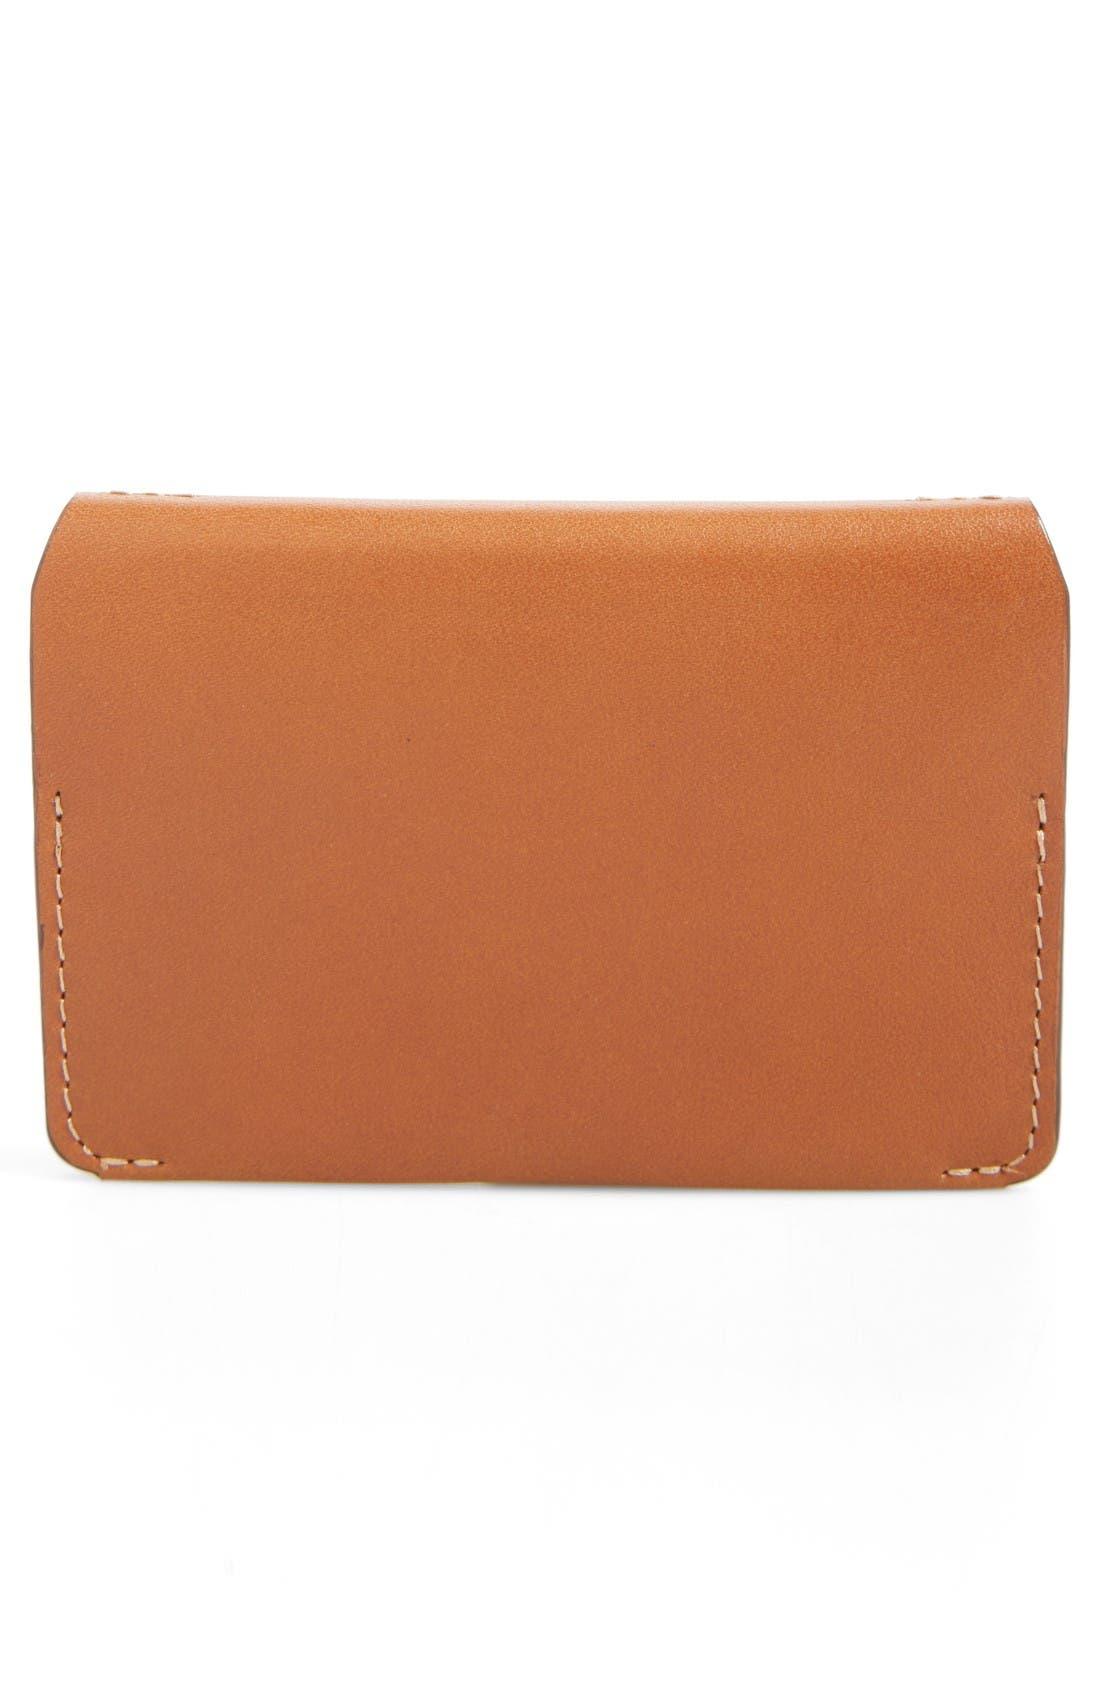 Leather Card Case,                             Alternate thumbnail 3, color,                             Caramel